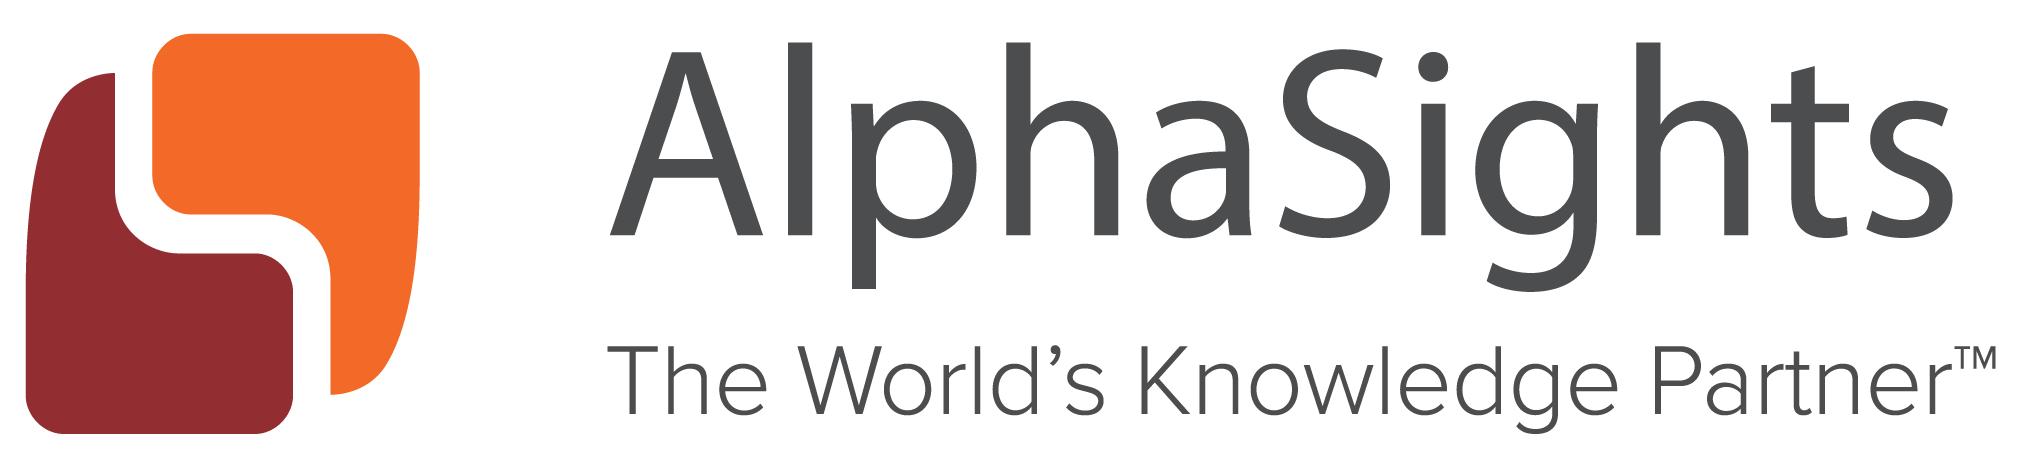 alphasights_logo_1.png